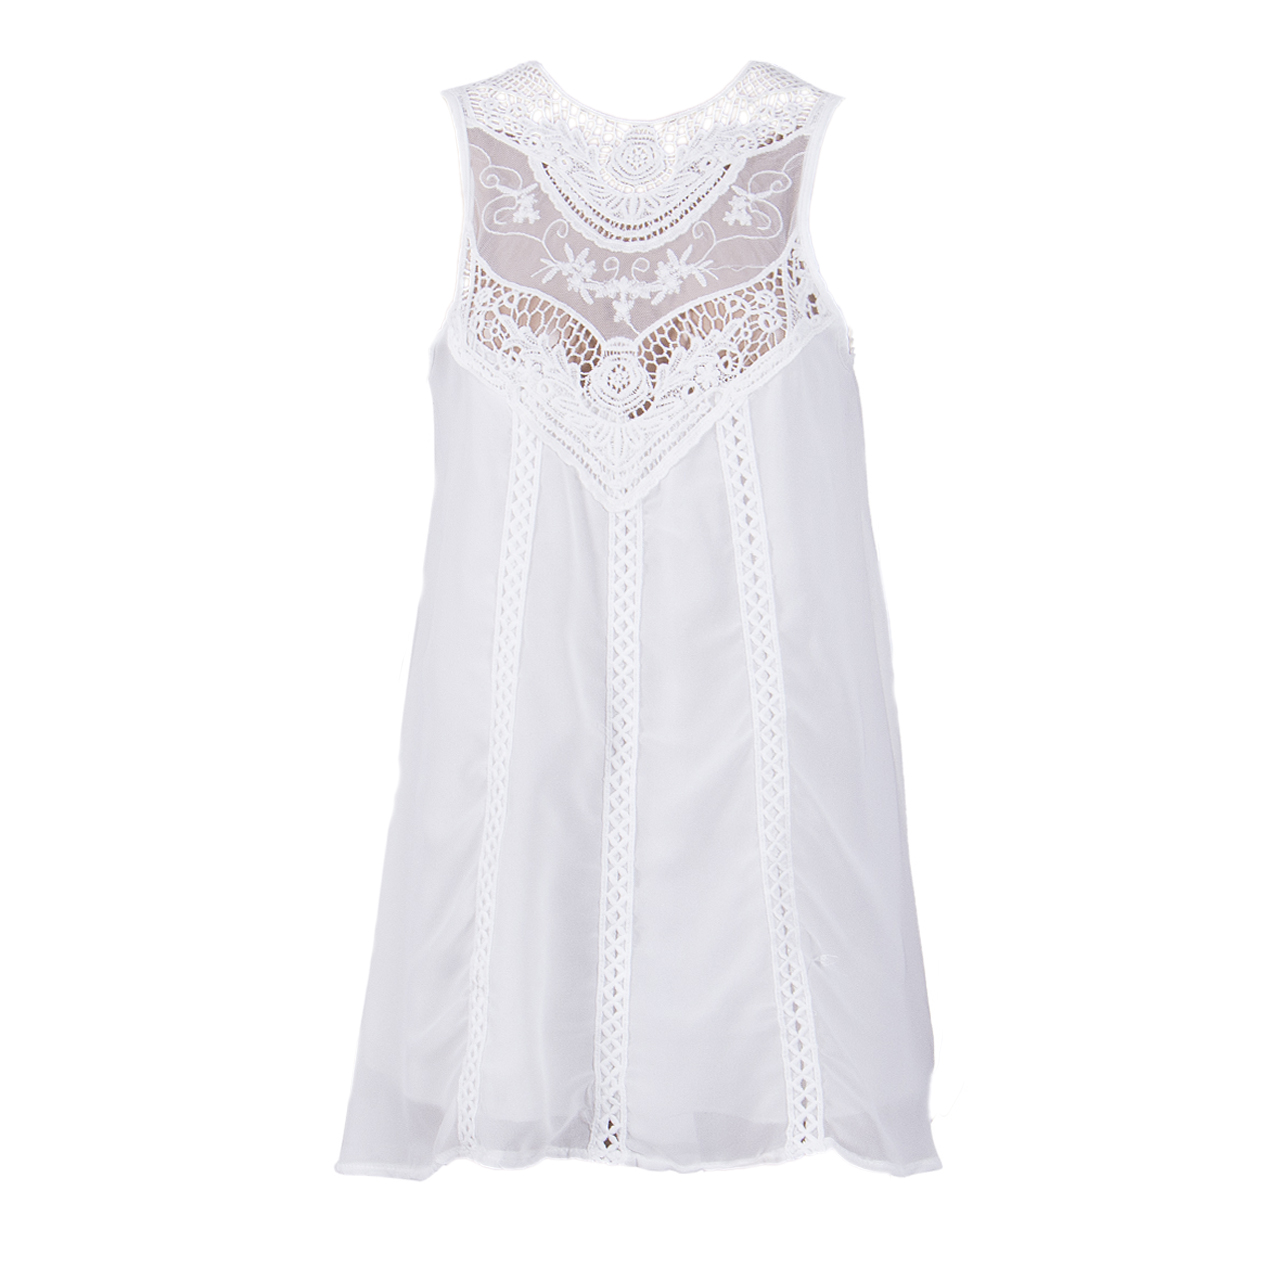 HOT Fashion Summer Dress 2017 Women Clothing Lace Sleeveless Womens Short Mini Ladies Beachwear White Chiffon Mini Dress 6-16